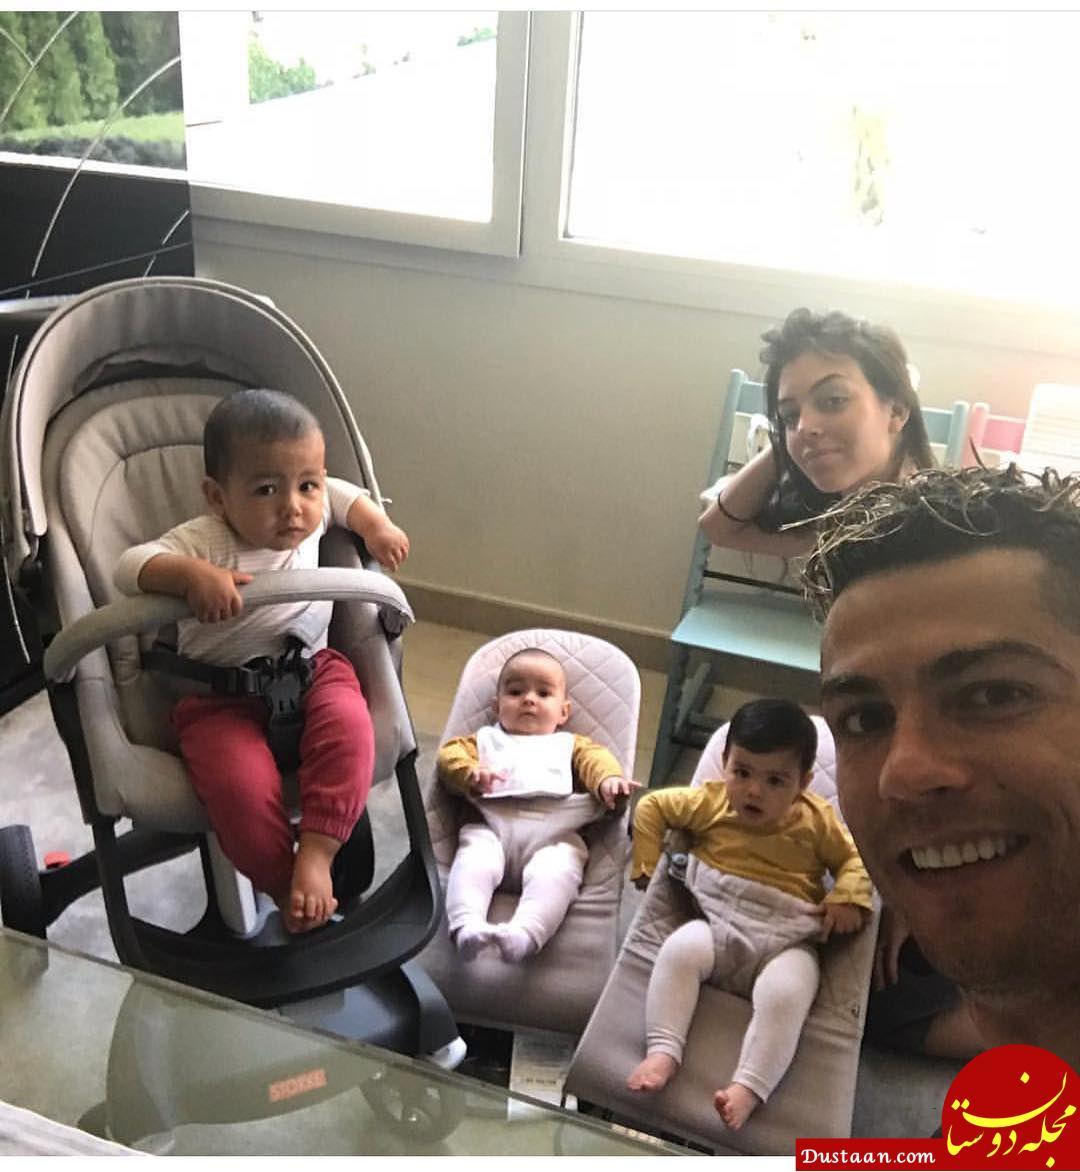 www.dustaan.com رونالدو و نامزدش جورجینا رودریگرز به همراه ۳ فرزندشان! +عکس